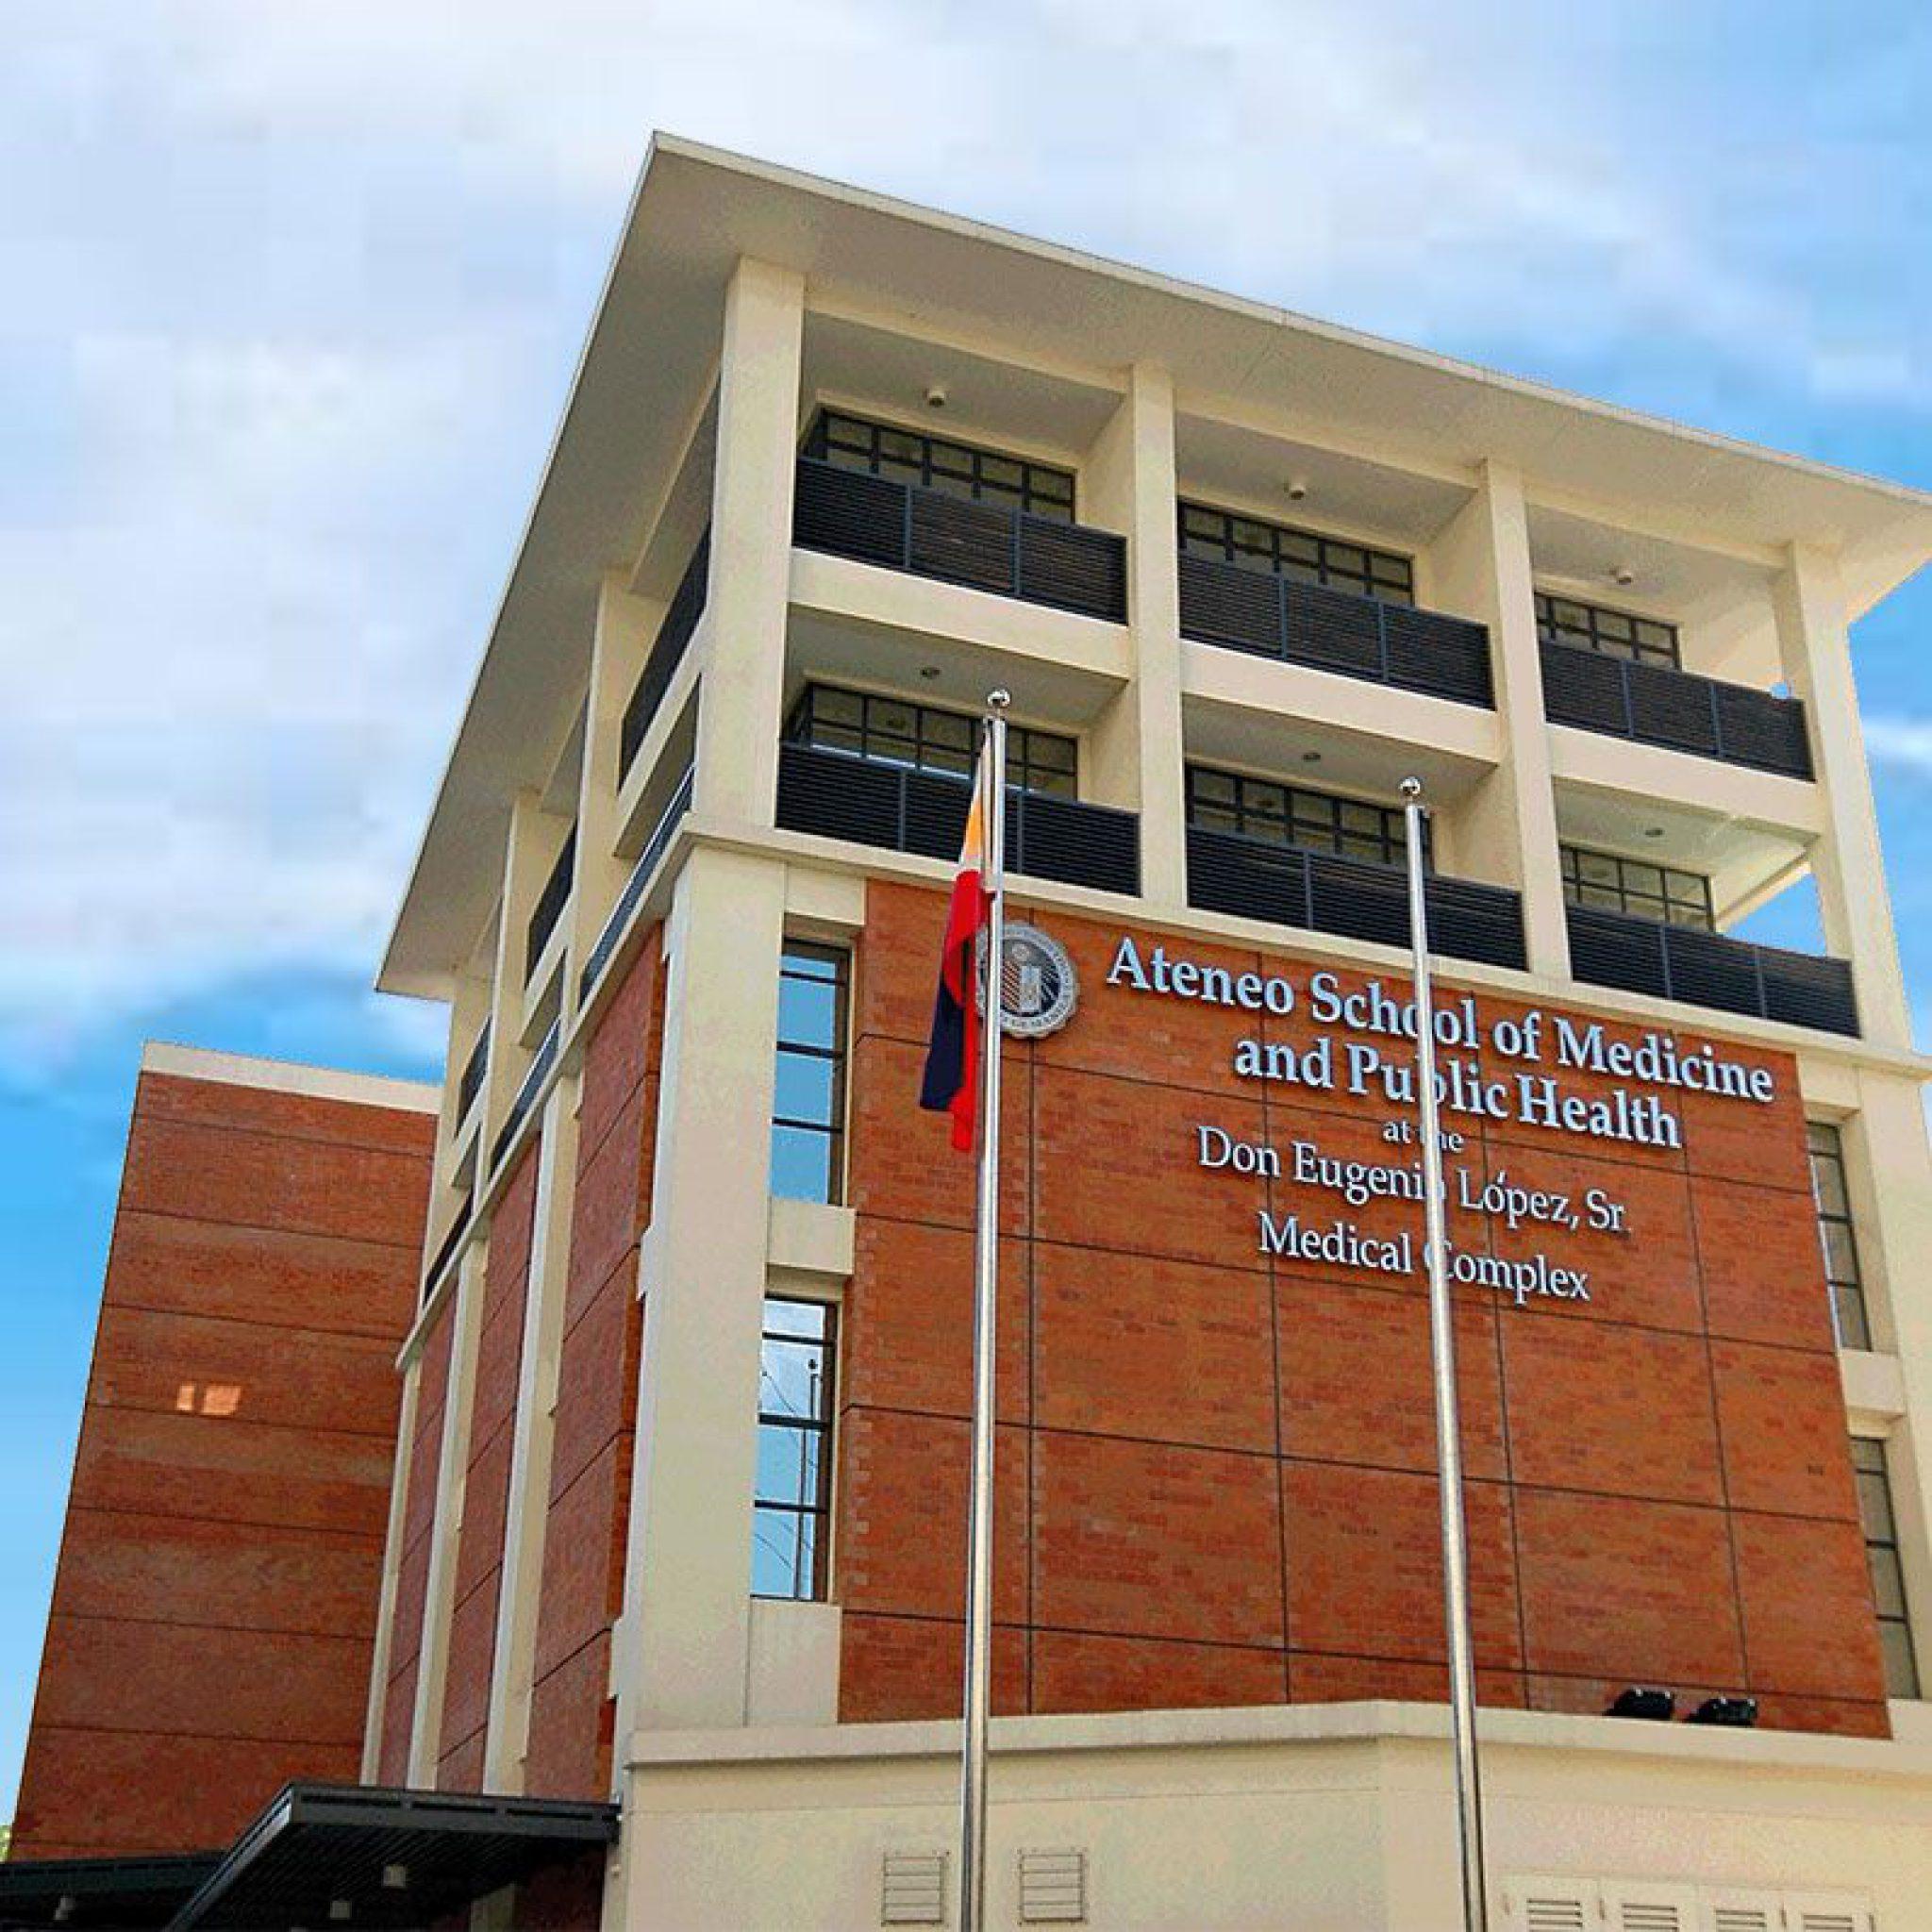 Ateneo de Manila University – School of Medicine and Public Health